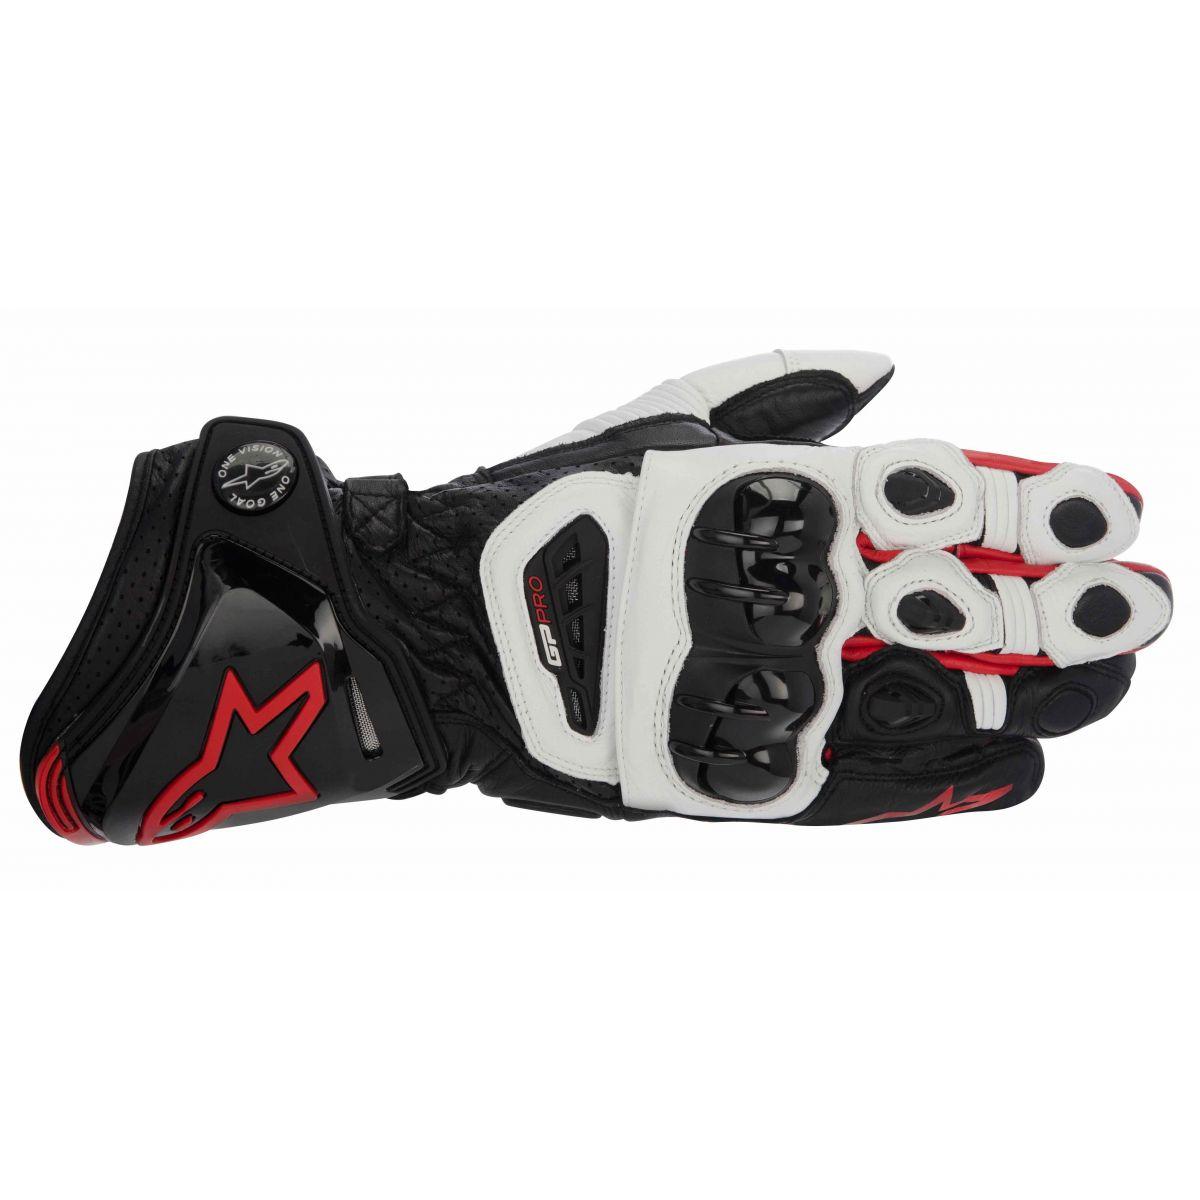 Luva Alpinestars GP Pro Couro Black White Red (Atem)  - Super Bike - Loja Oficial Alpinestars